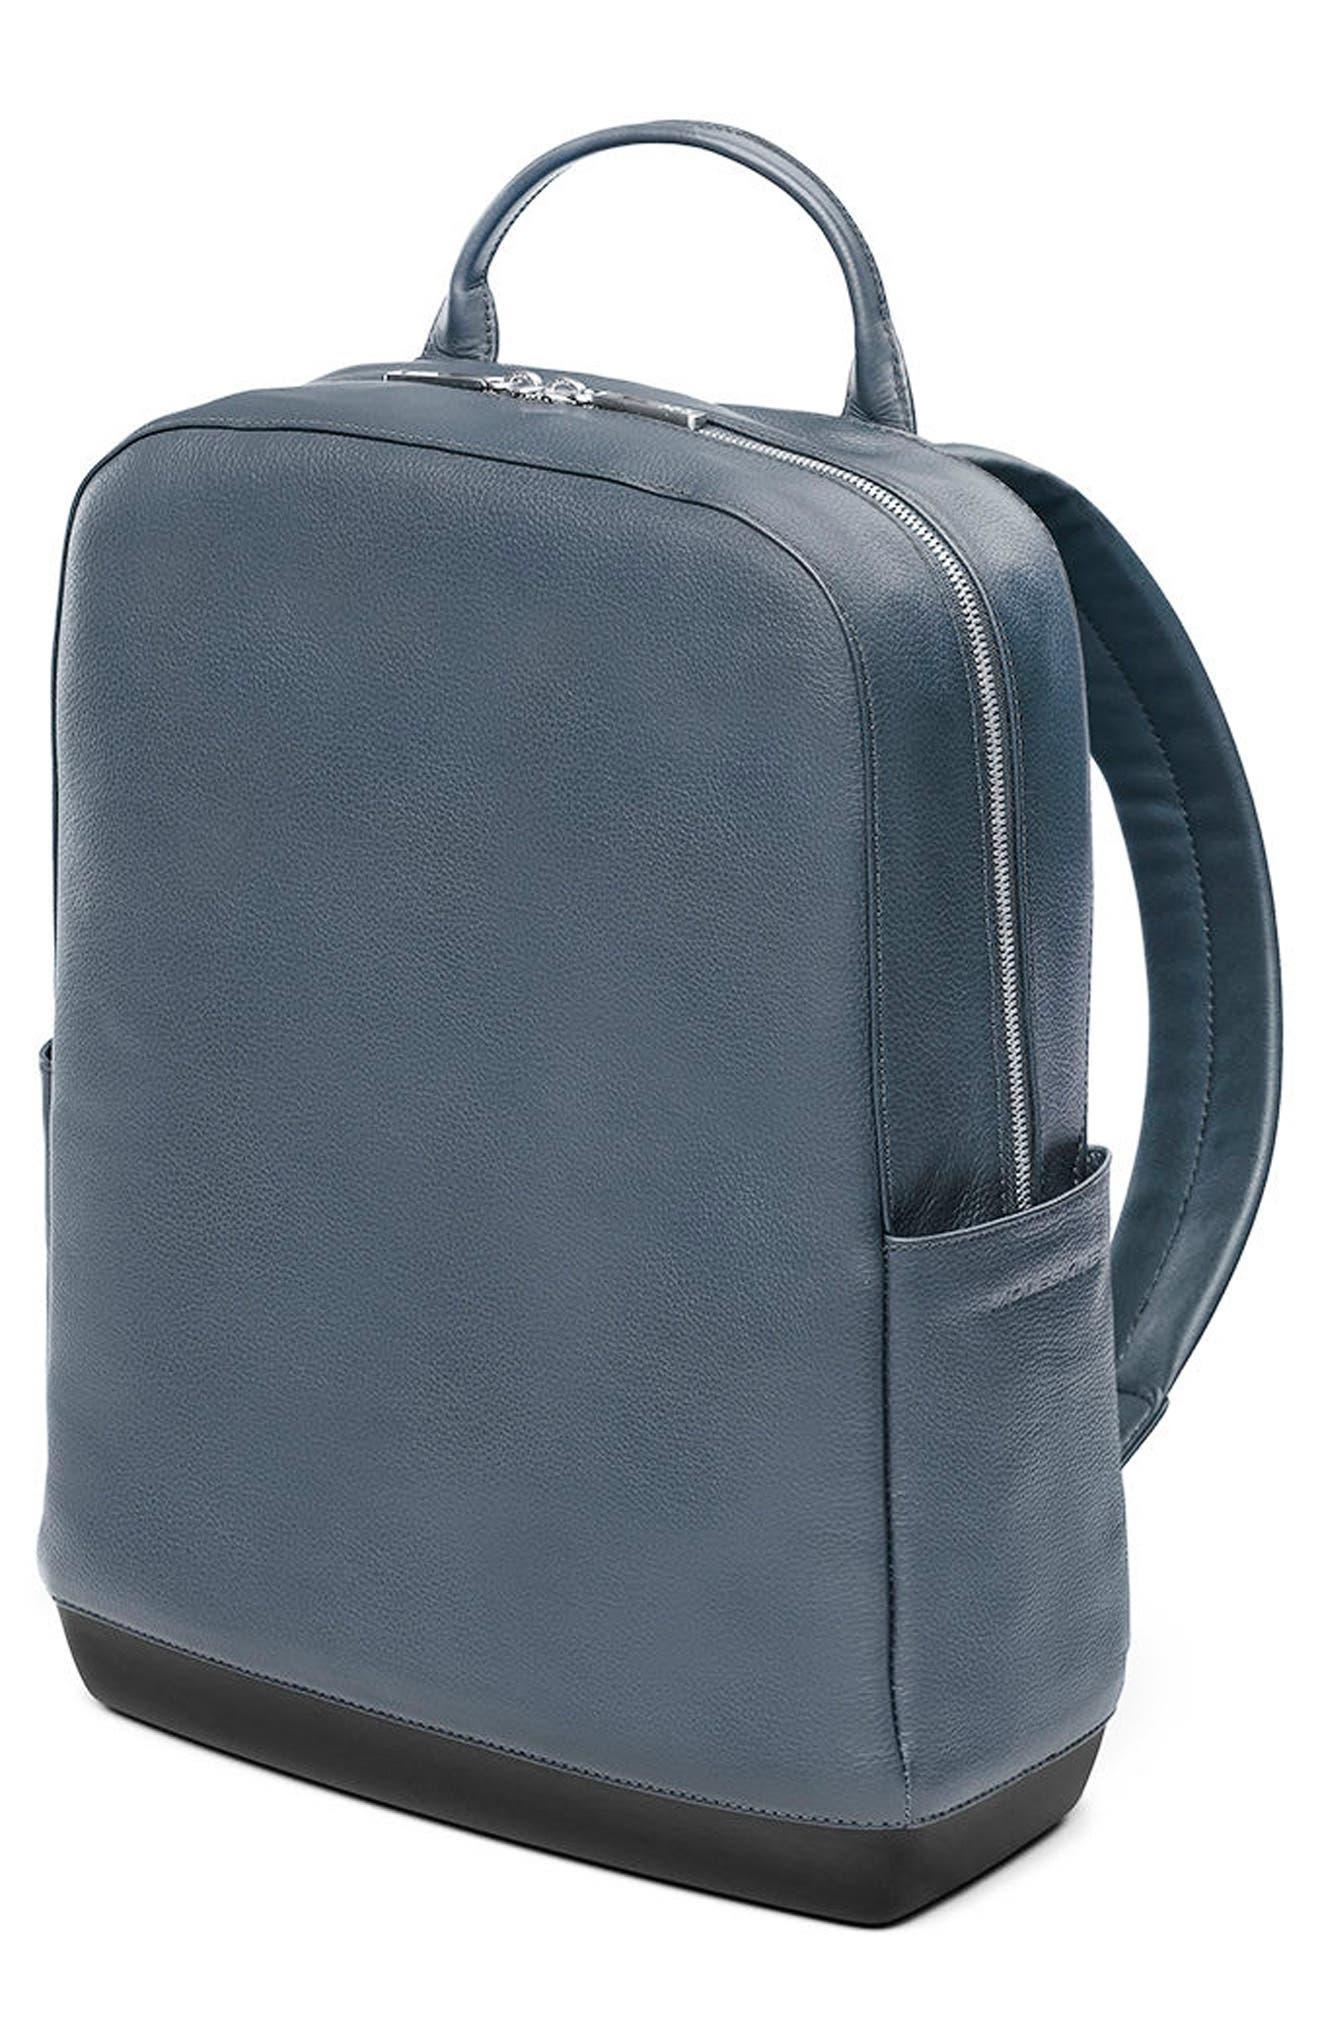 Moleskine Classic Leather Backpack